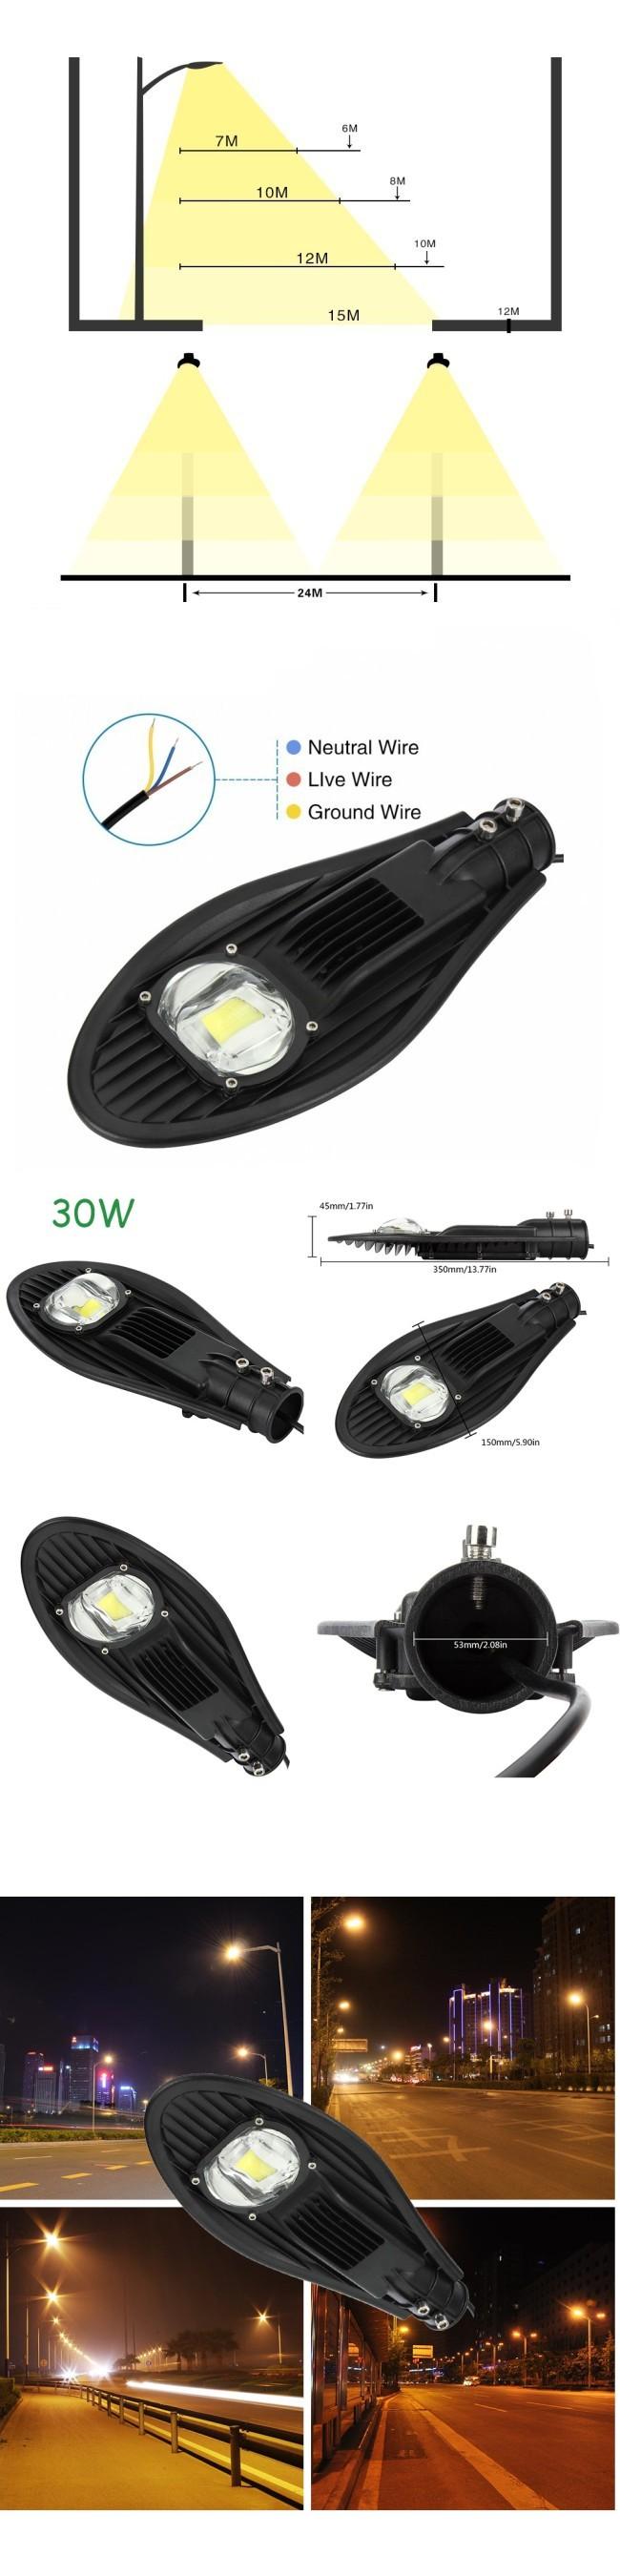 50W LED Street Light Highway COB LED Lamp Aluminum IP65